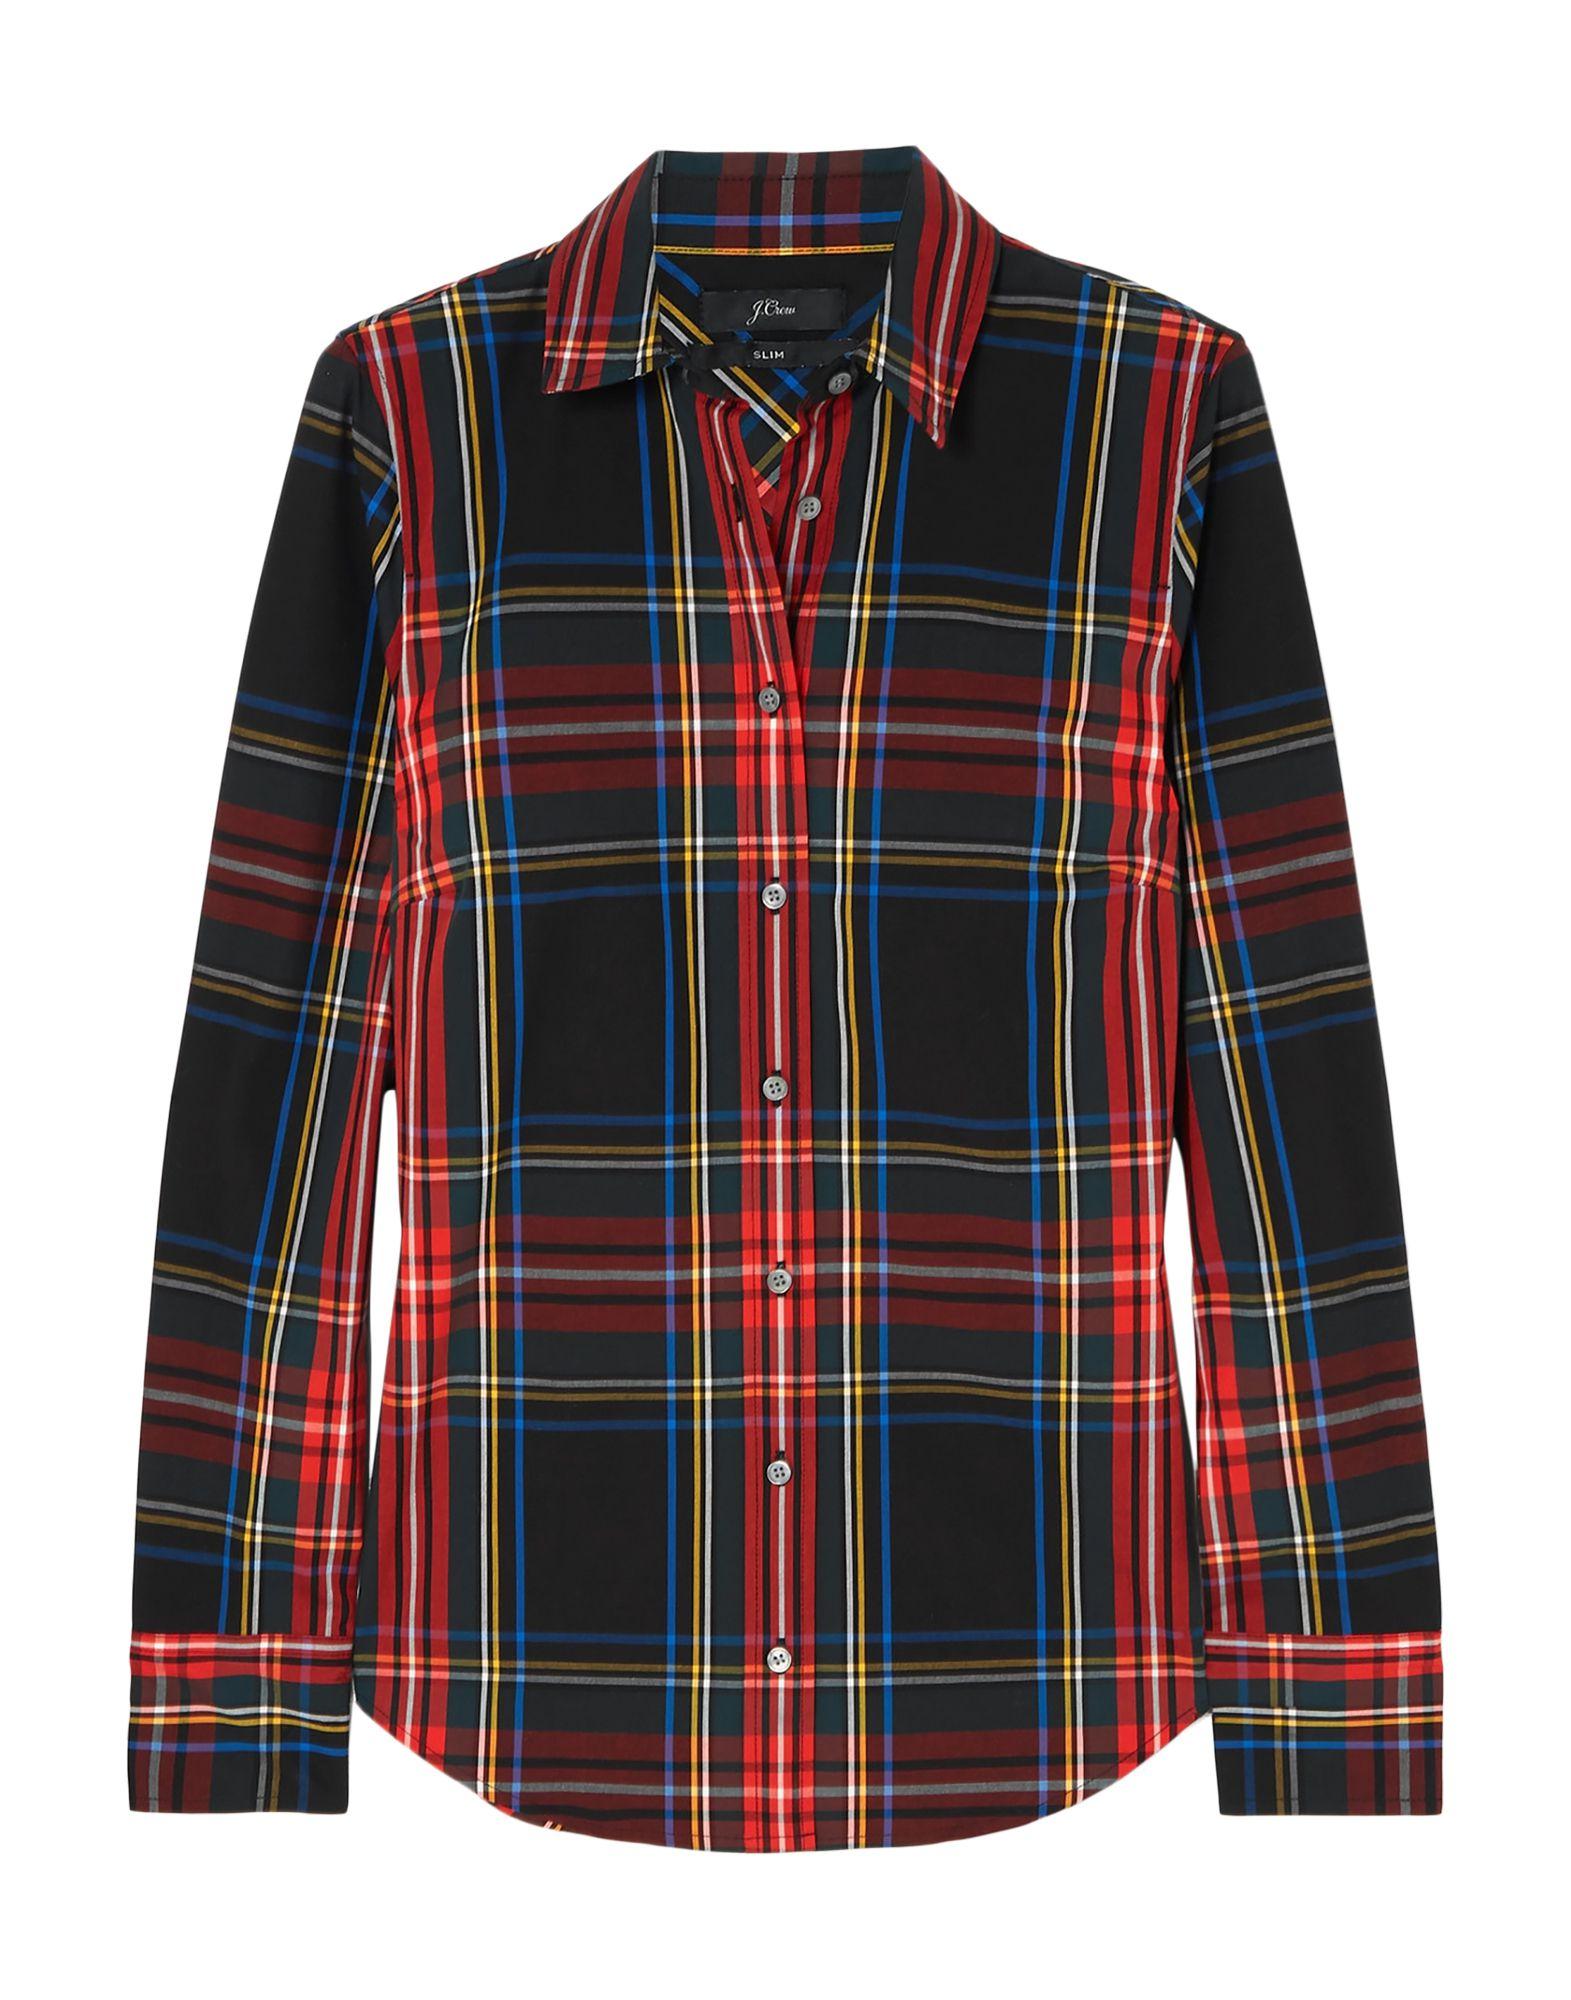 J.CREW Shirts. plain weave, no appliqués, tartan plaid, front closure, button closing, long sleeves, buttoned cuffs, classic neckline, no pockets, stretch. 98% Cotton, 2% Elastane